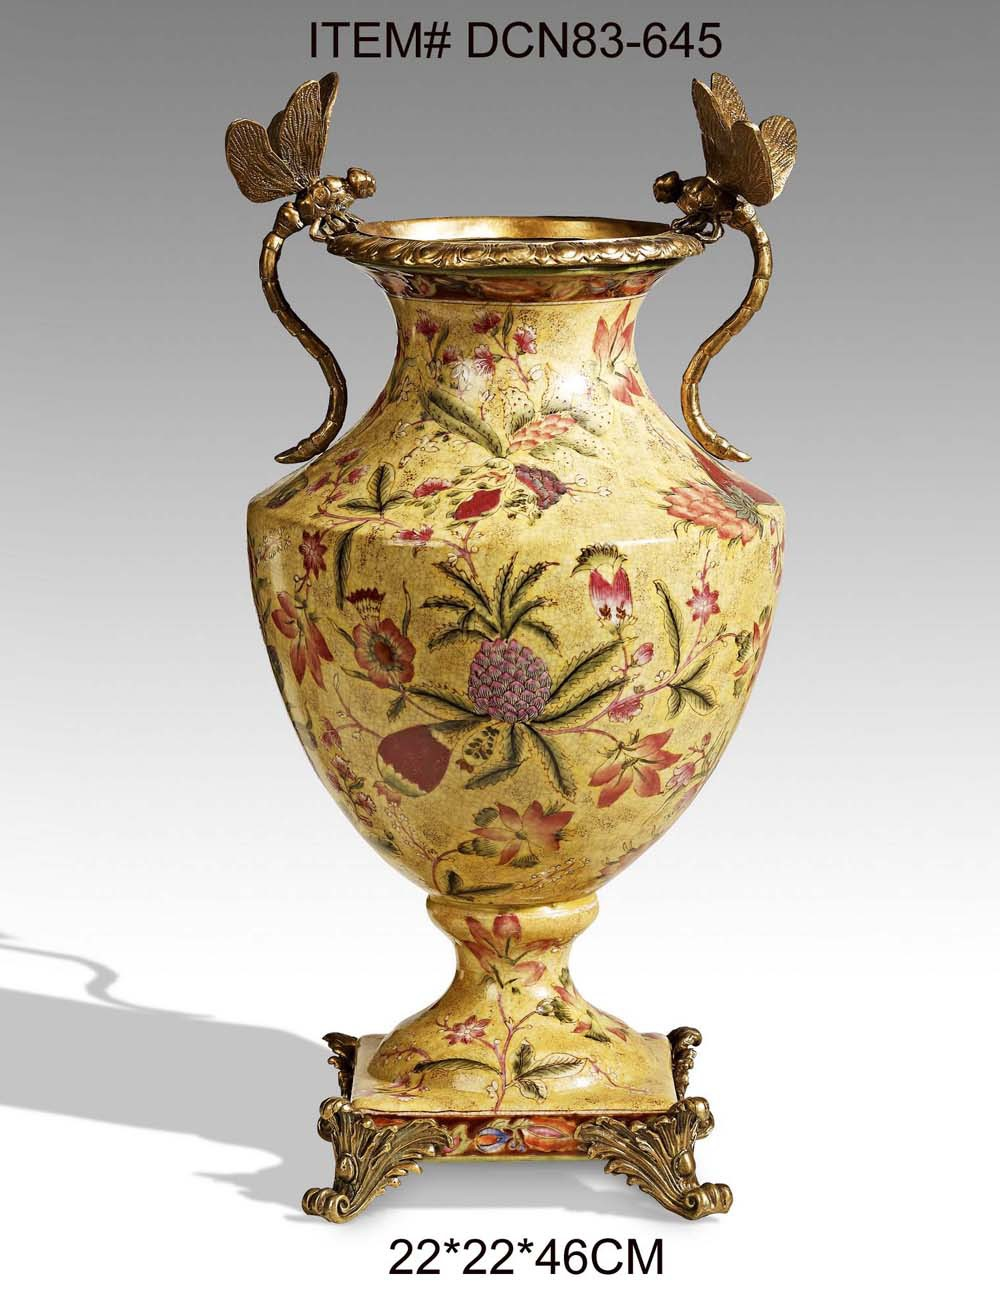 European style luxury porcelain dragonfly decorative vase antique dcn83 645g reviewsmspy